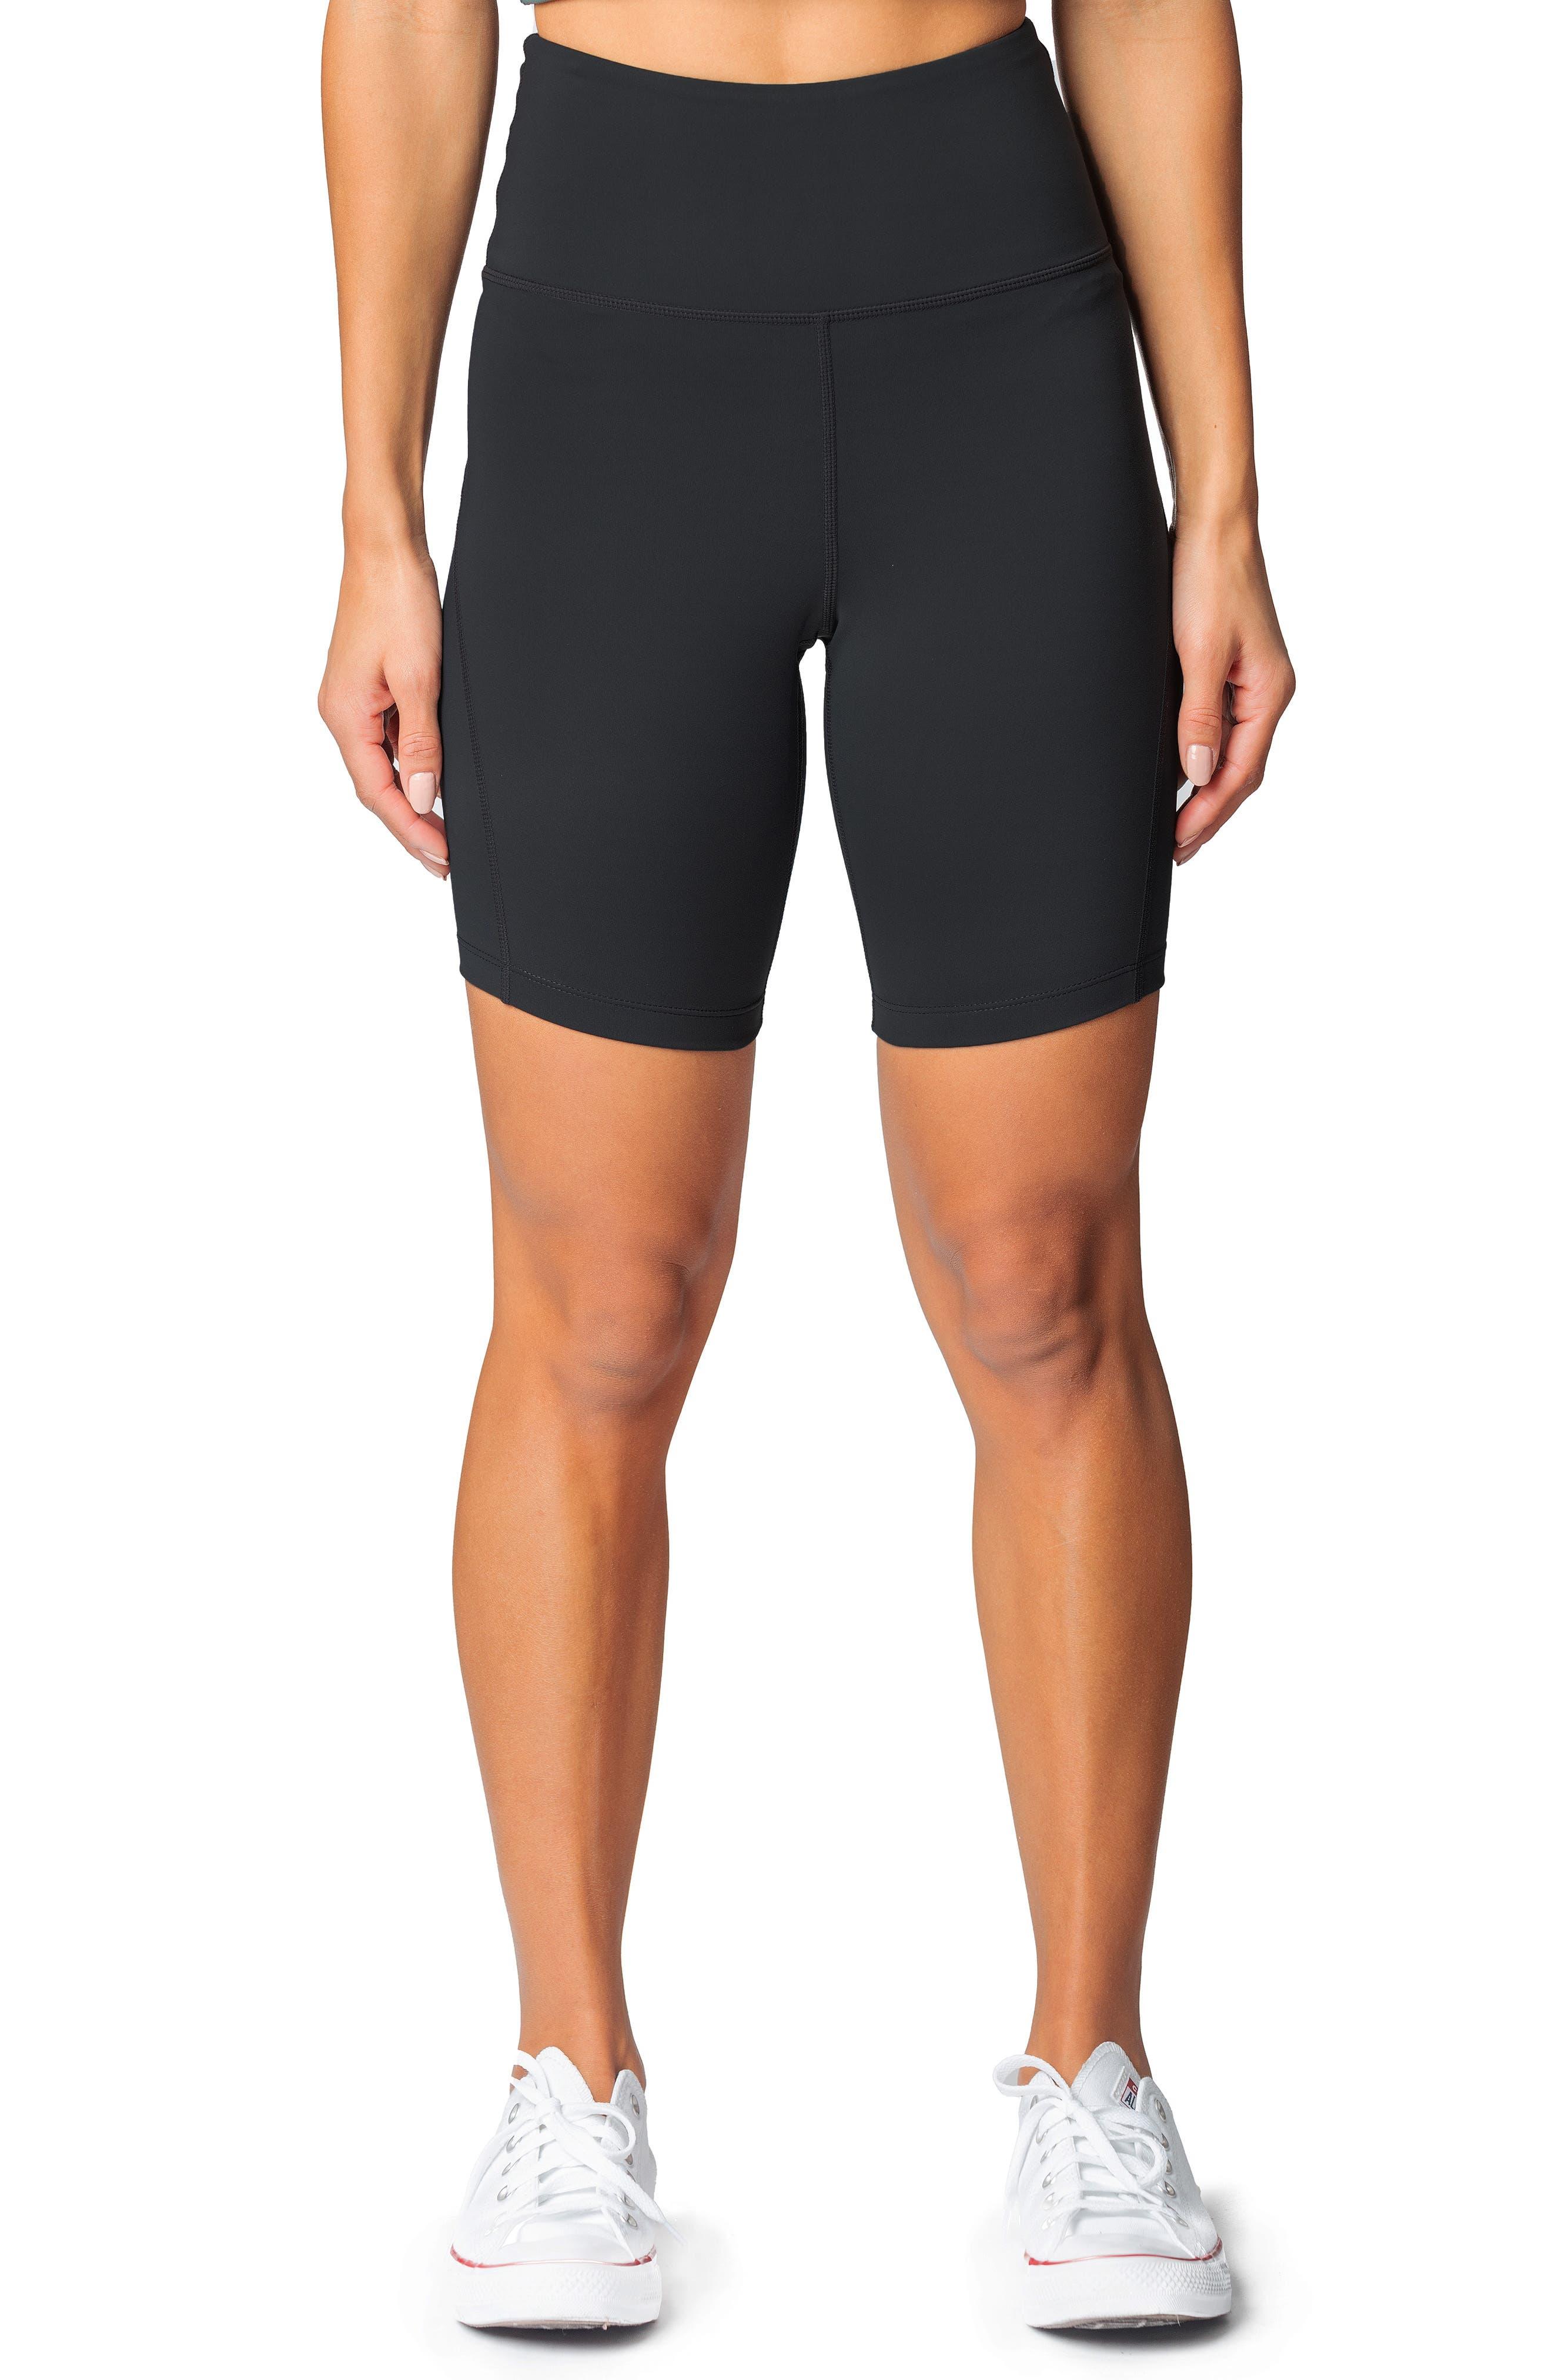 Mercer High Waist Bike Shorts